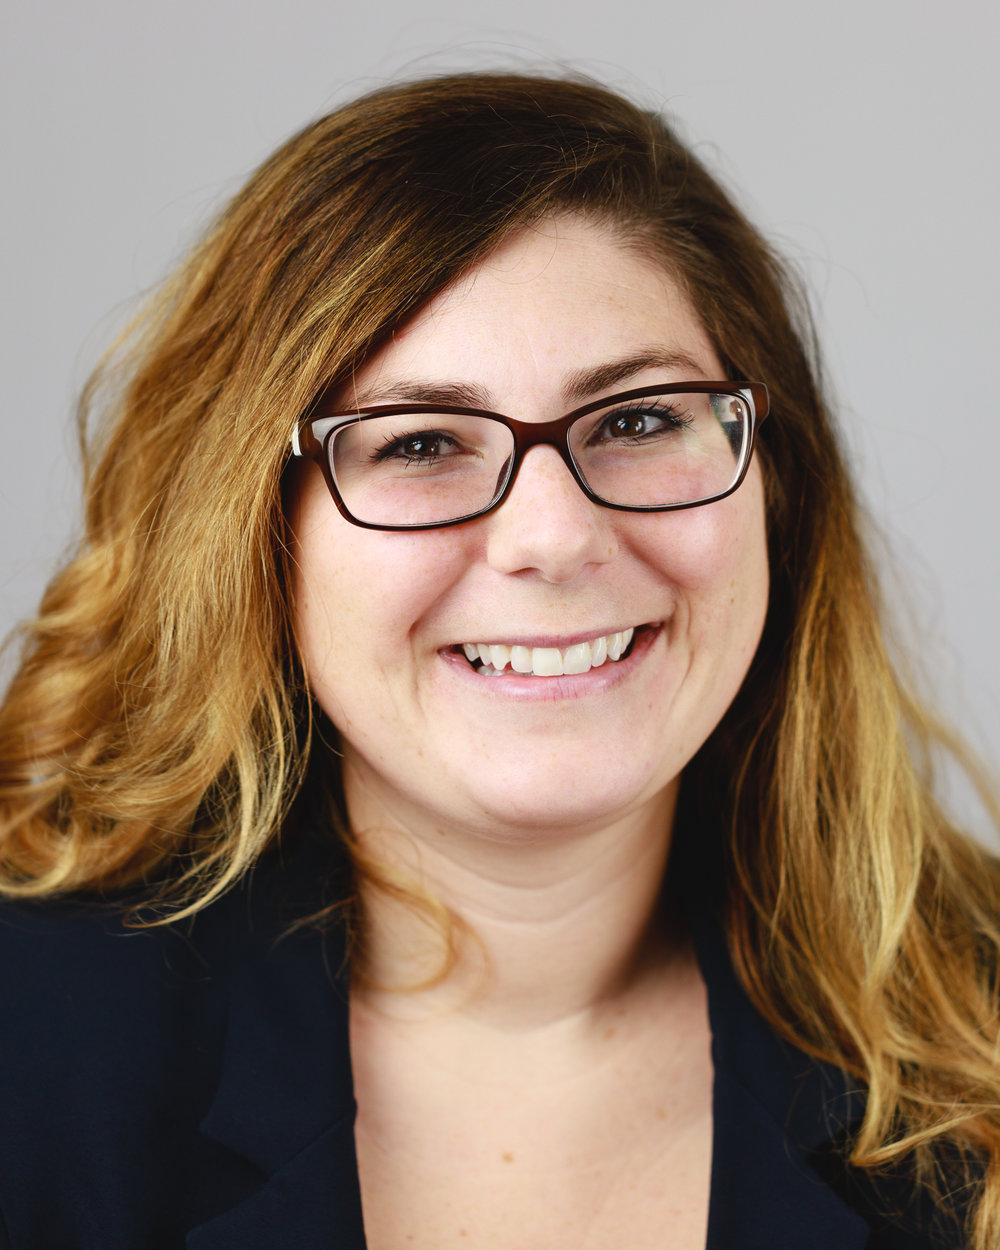 Anna Mrdeza - Vice President of Human Resources